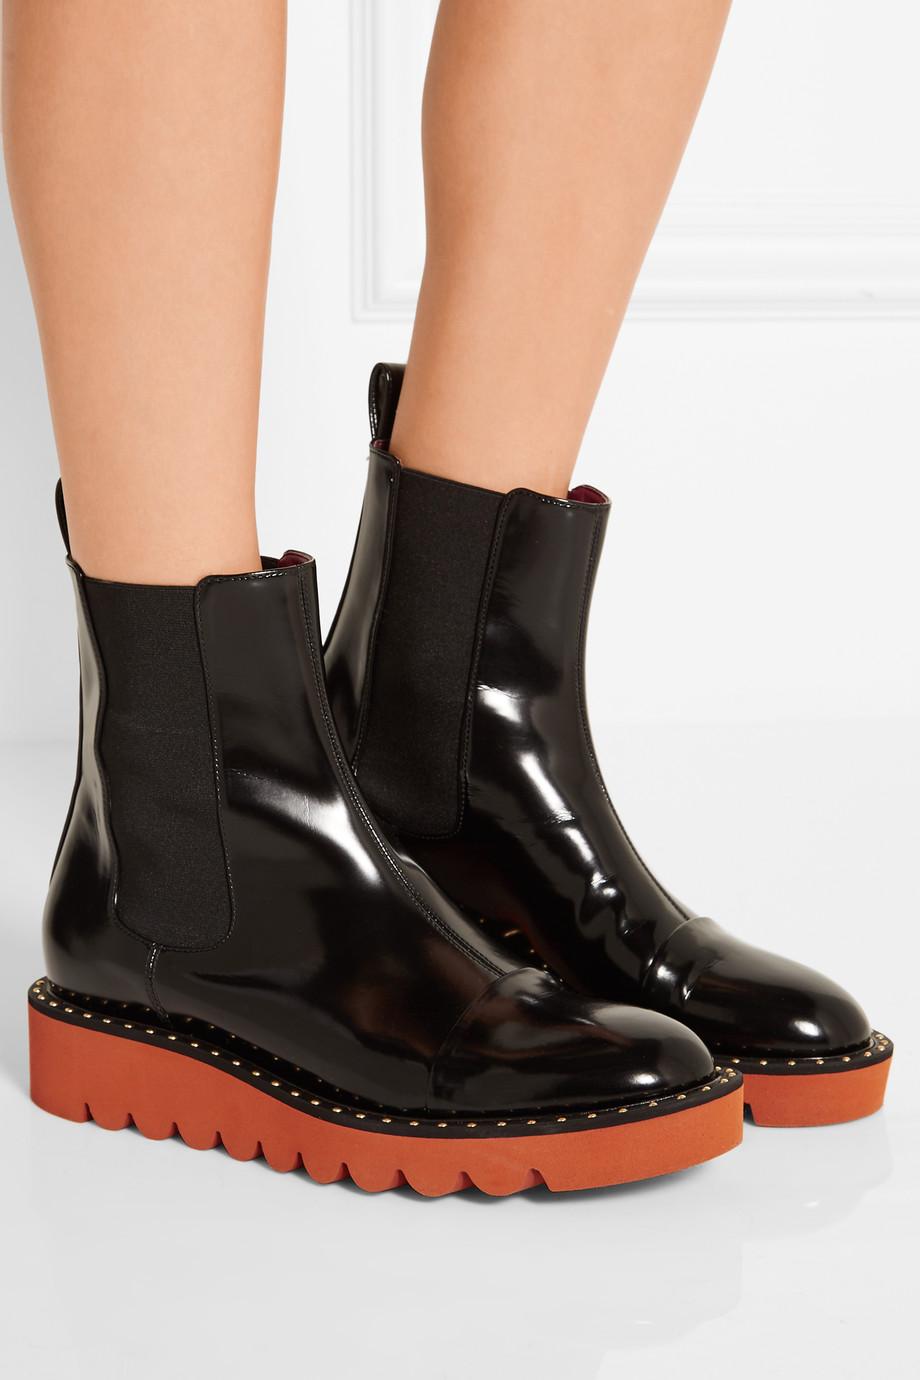 stella-mccartney-boots-at-net-a-porter